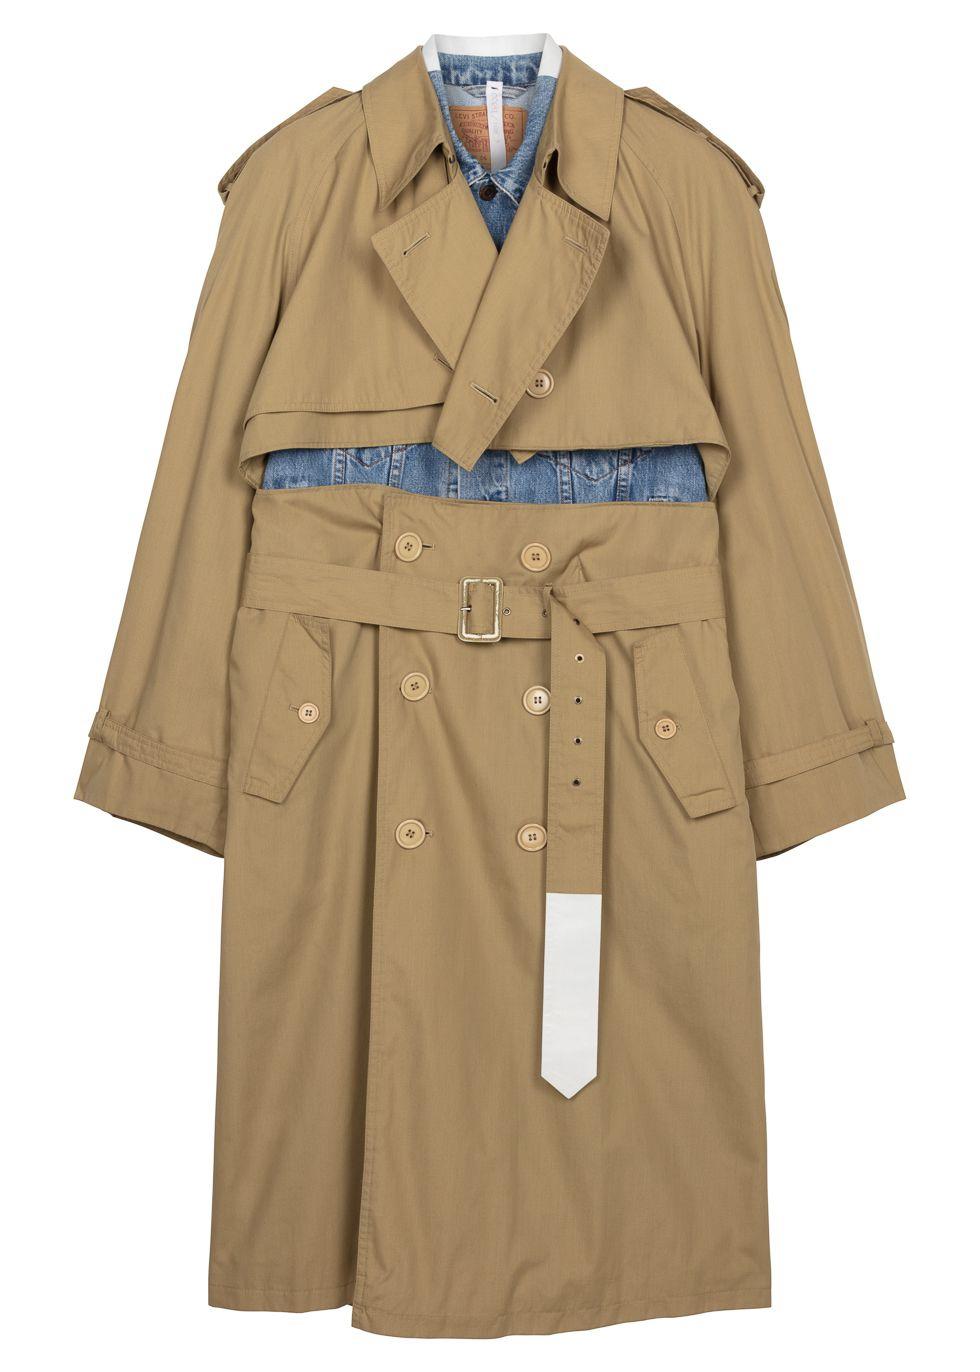 Levi's X Yves Saint Laurent panelled trench coat